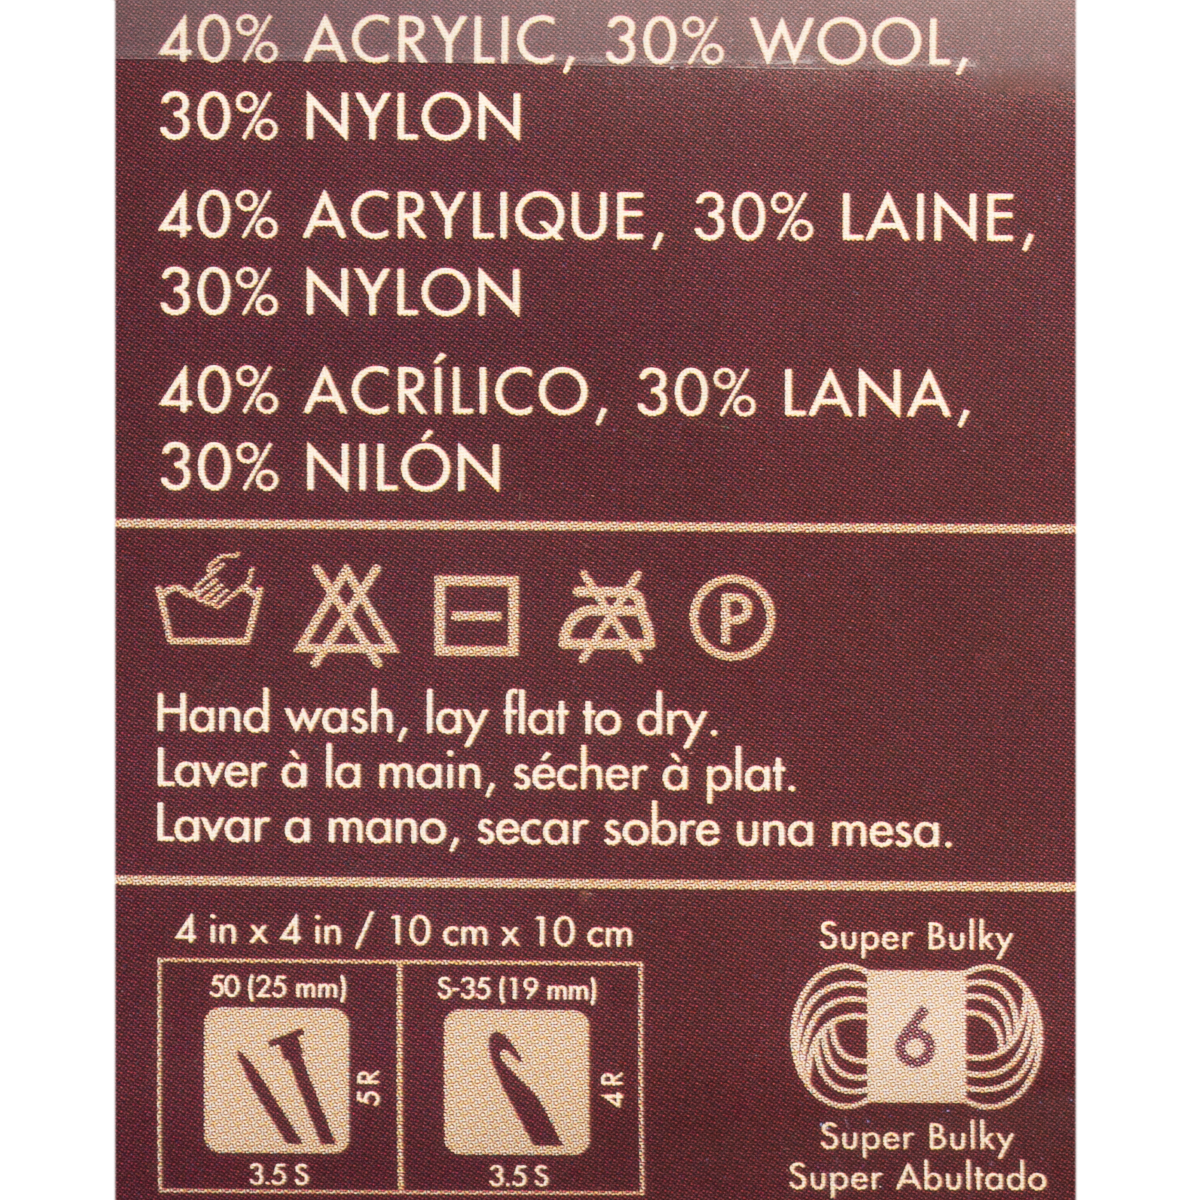 thumbnail 17 - 3pk-Lion-Brand-Imagine-Acrylic-Blend-Yarn-Super-Bulky-6-Knitting-Crochet-Soft